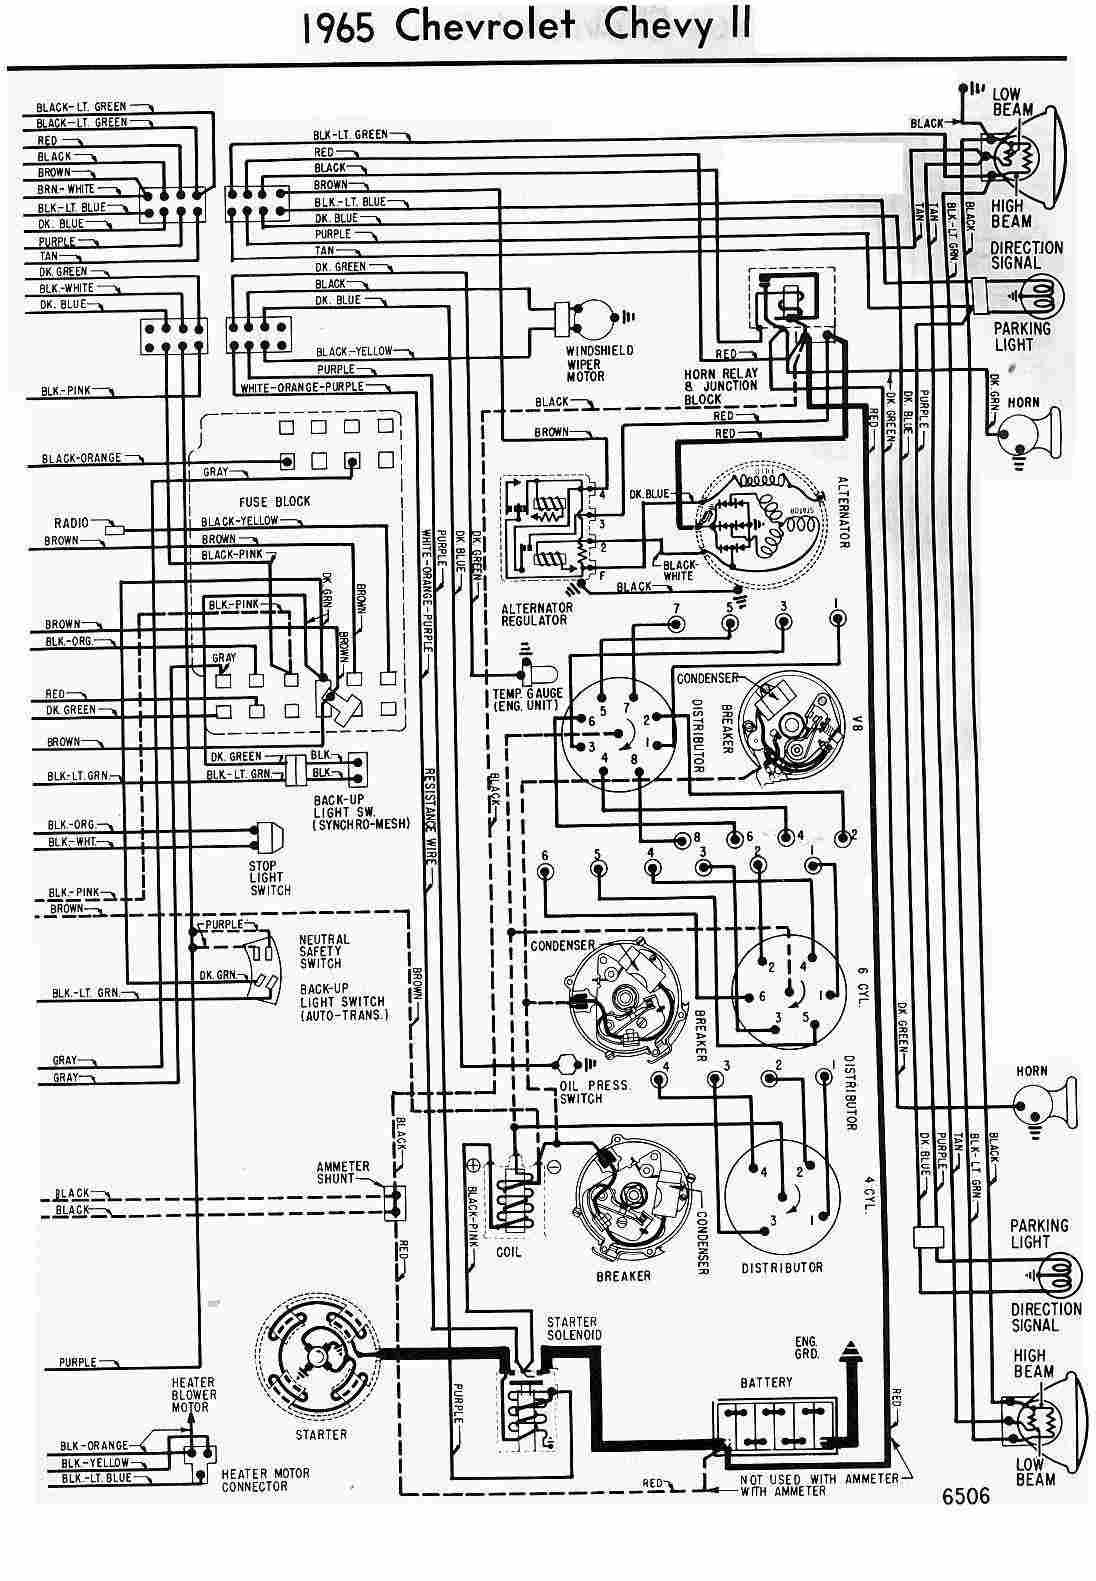 medium resolution of 1970 camaro wiring diagram as well chevy wiring diagrams scematic 1979 chevy camaro wiring diagram 1972